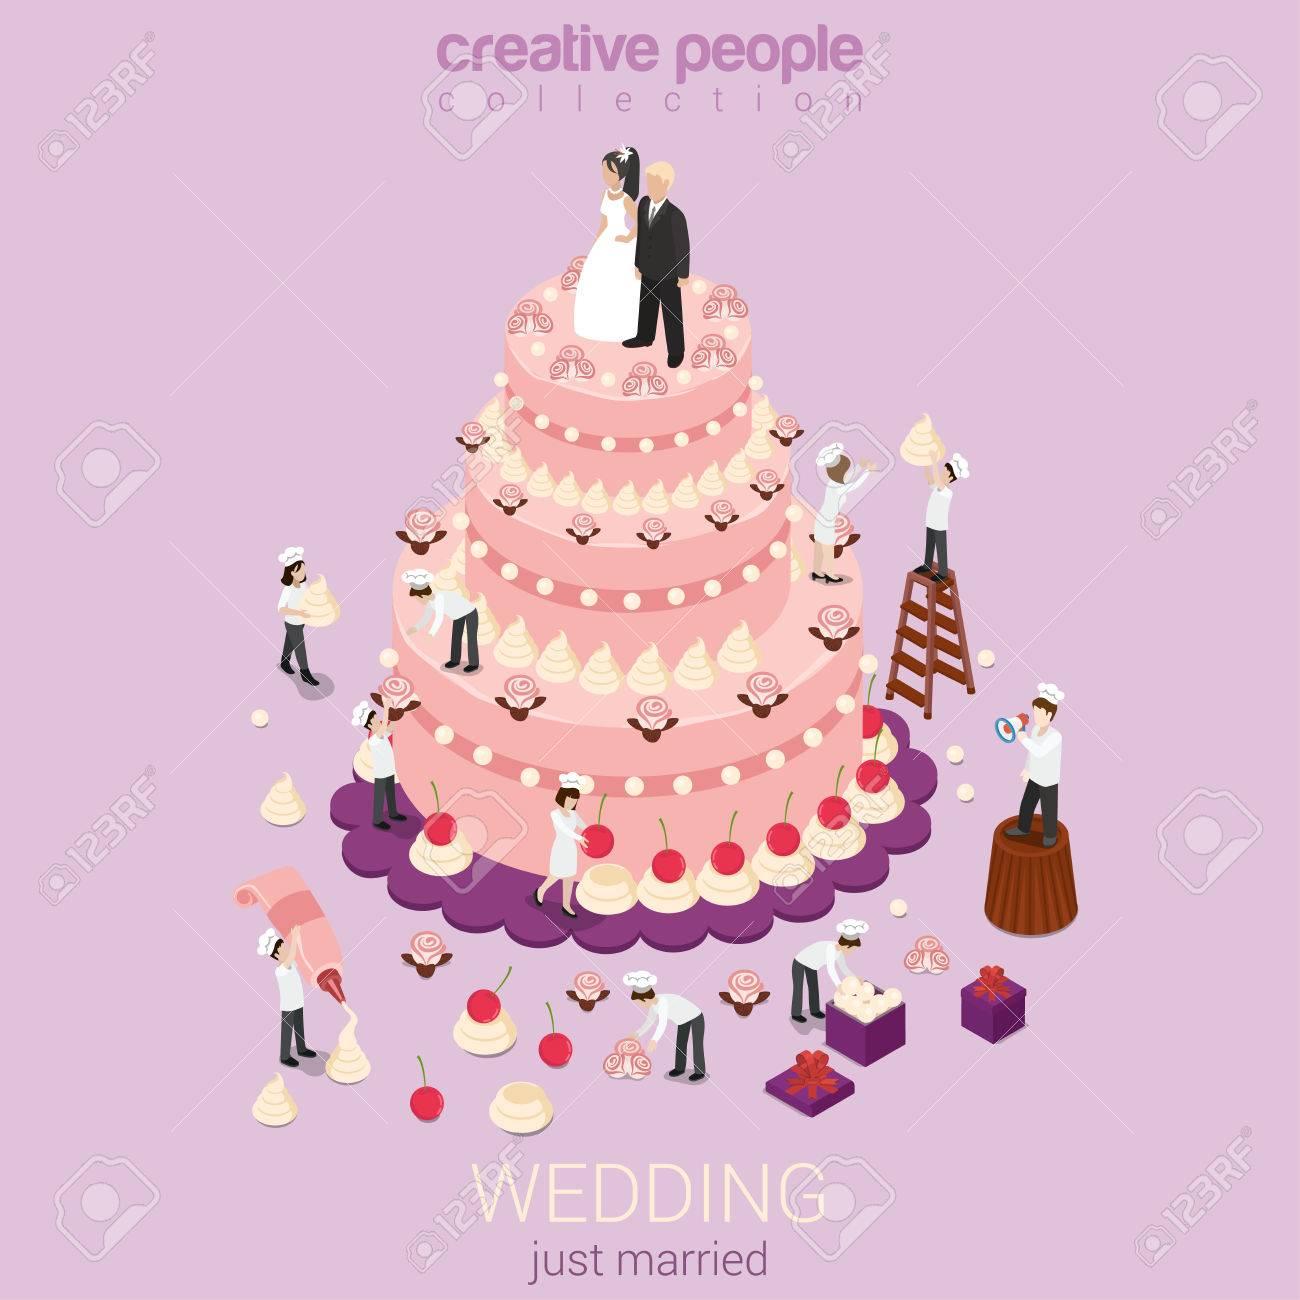 Wedding Cake Cream Tart Micro Just Married Couple Groom Bride